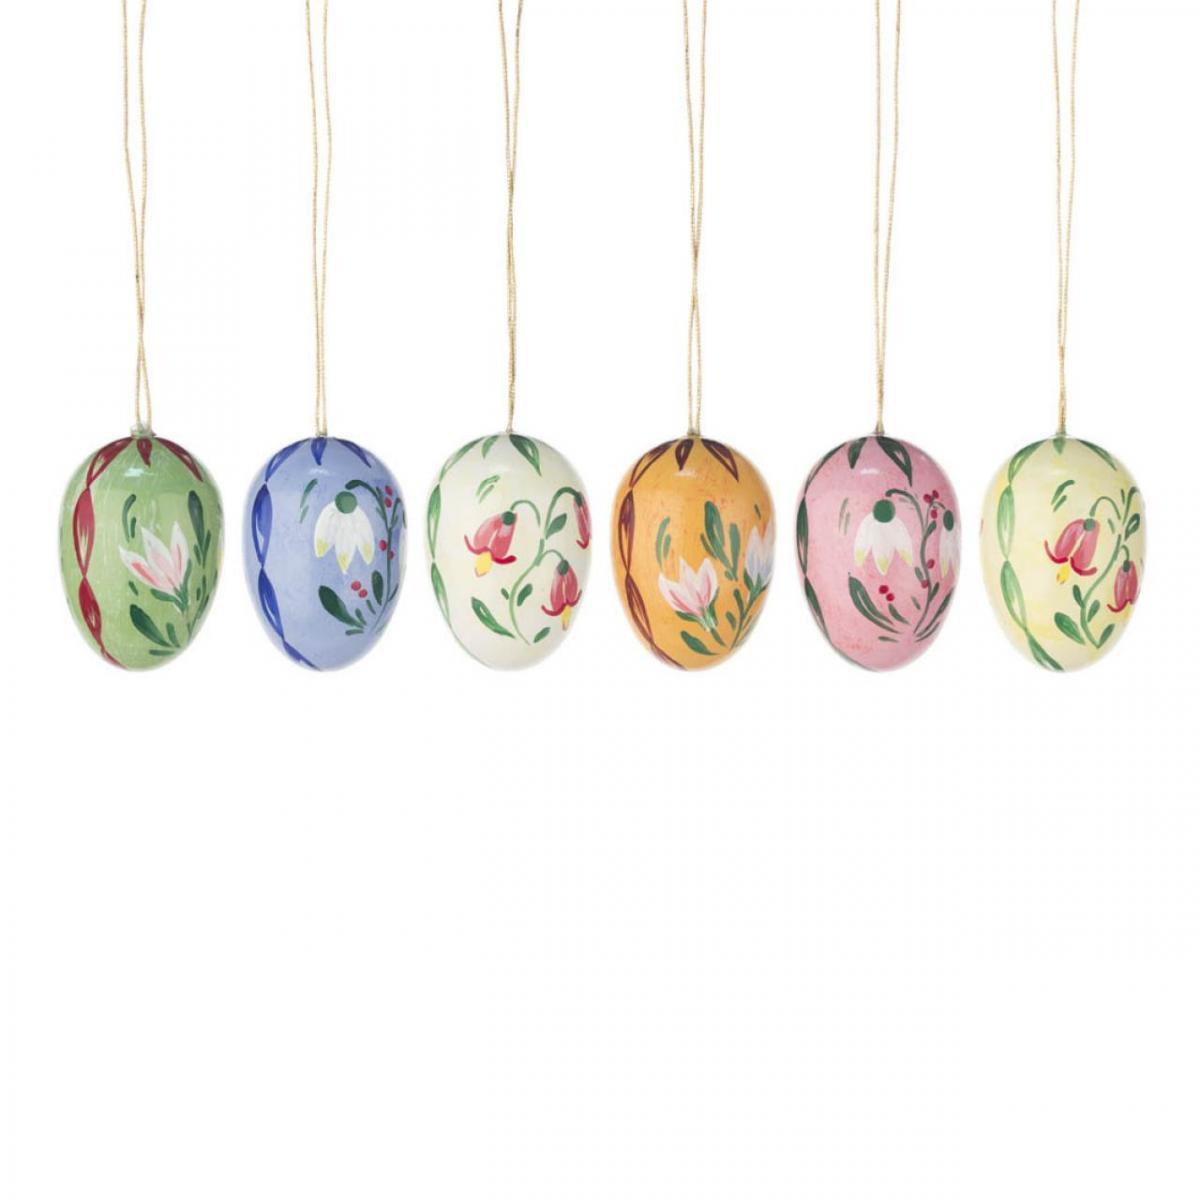 6 Ostereier, Holzeier mit Blumenmotiven ** Neu 2016 **